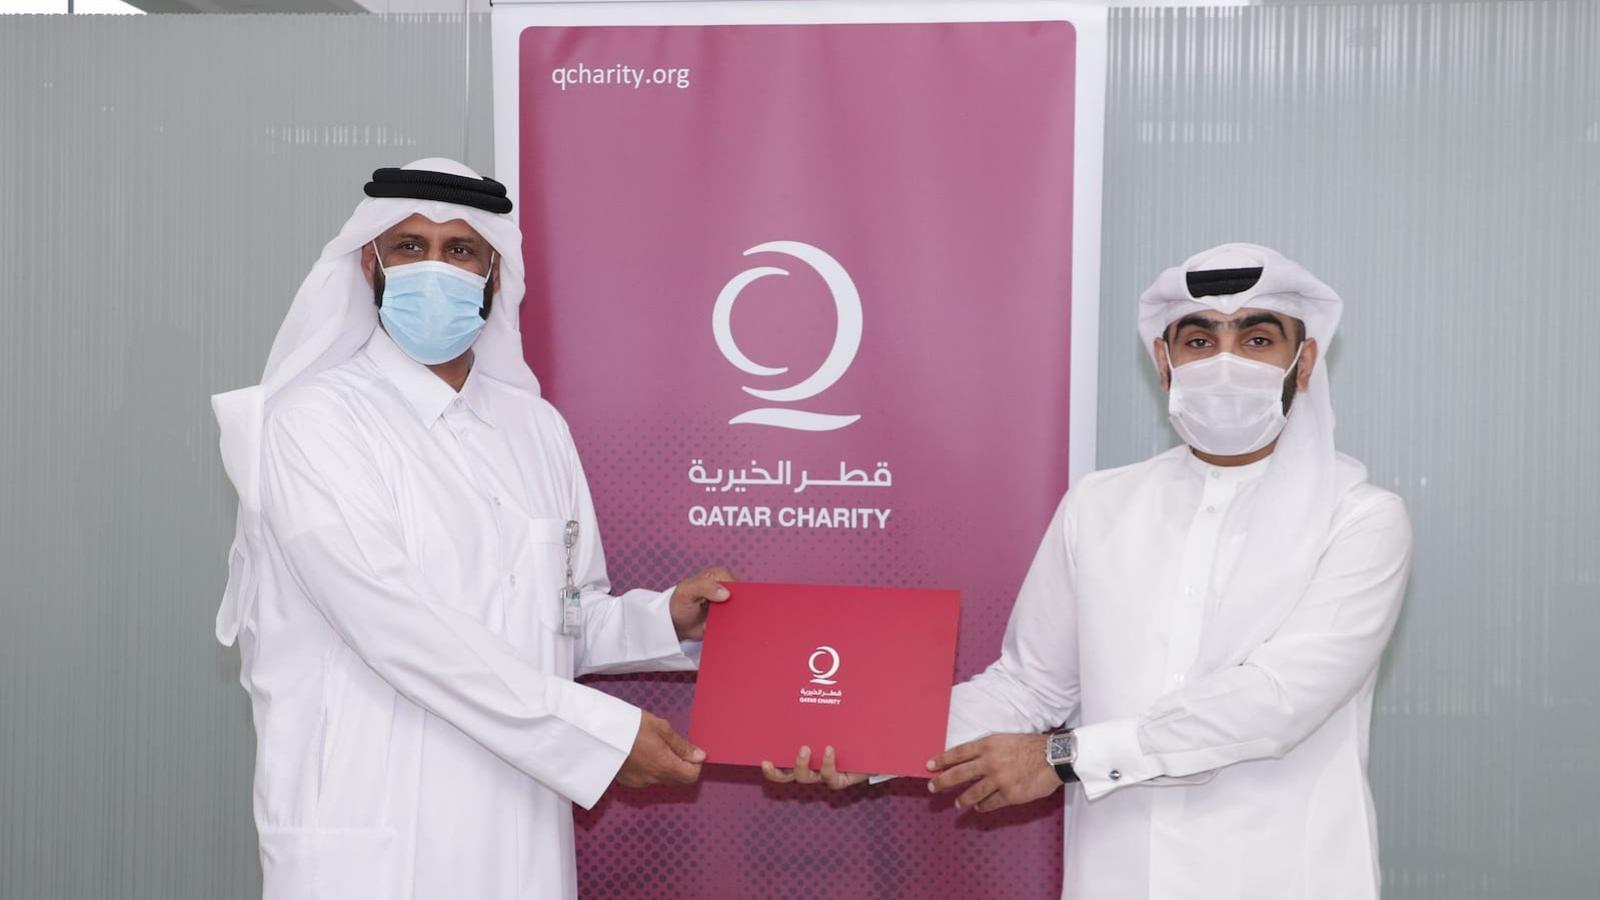 Mowasalat, Qatar Charity team up to distribute free Karwa SmartCards to workers